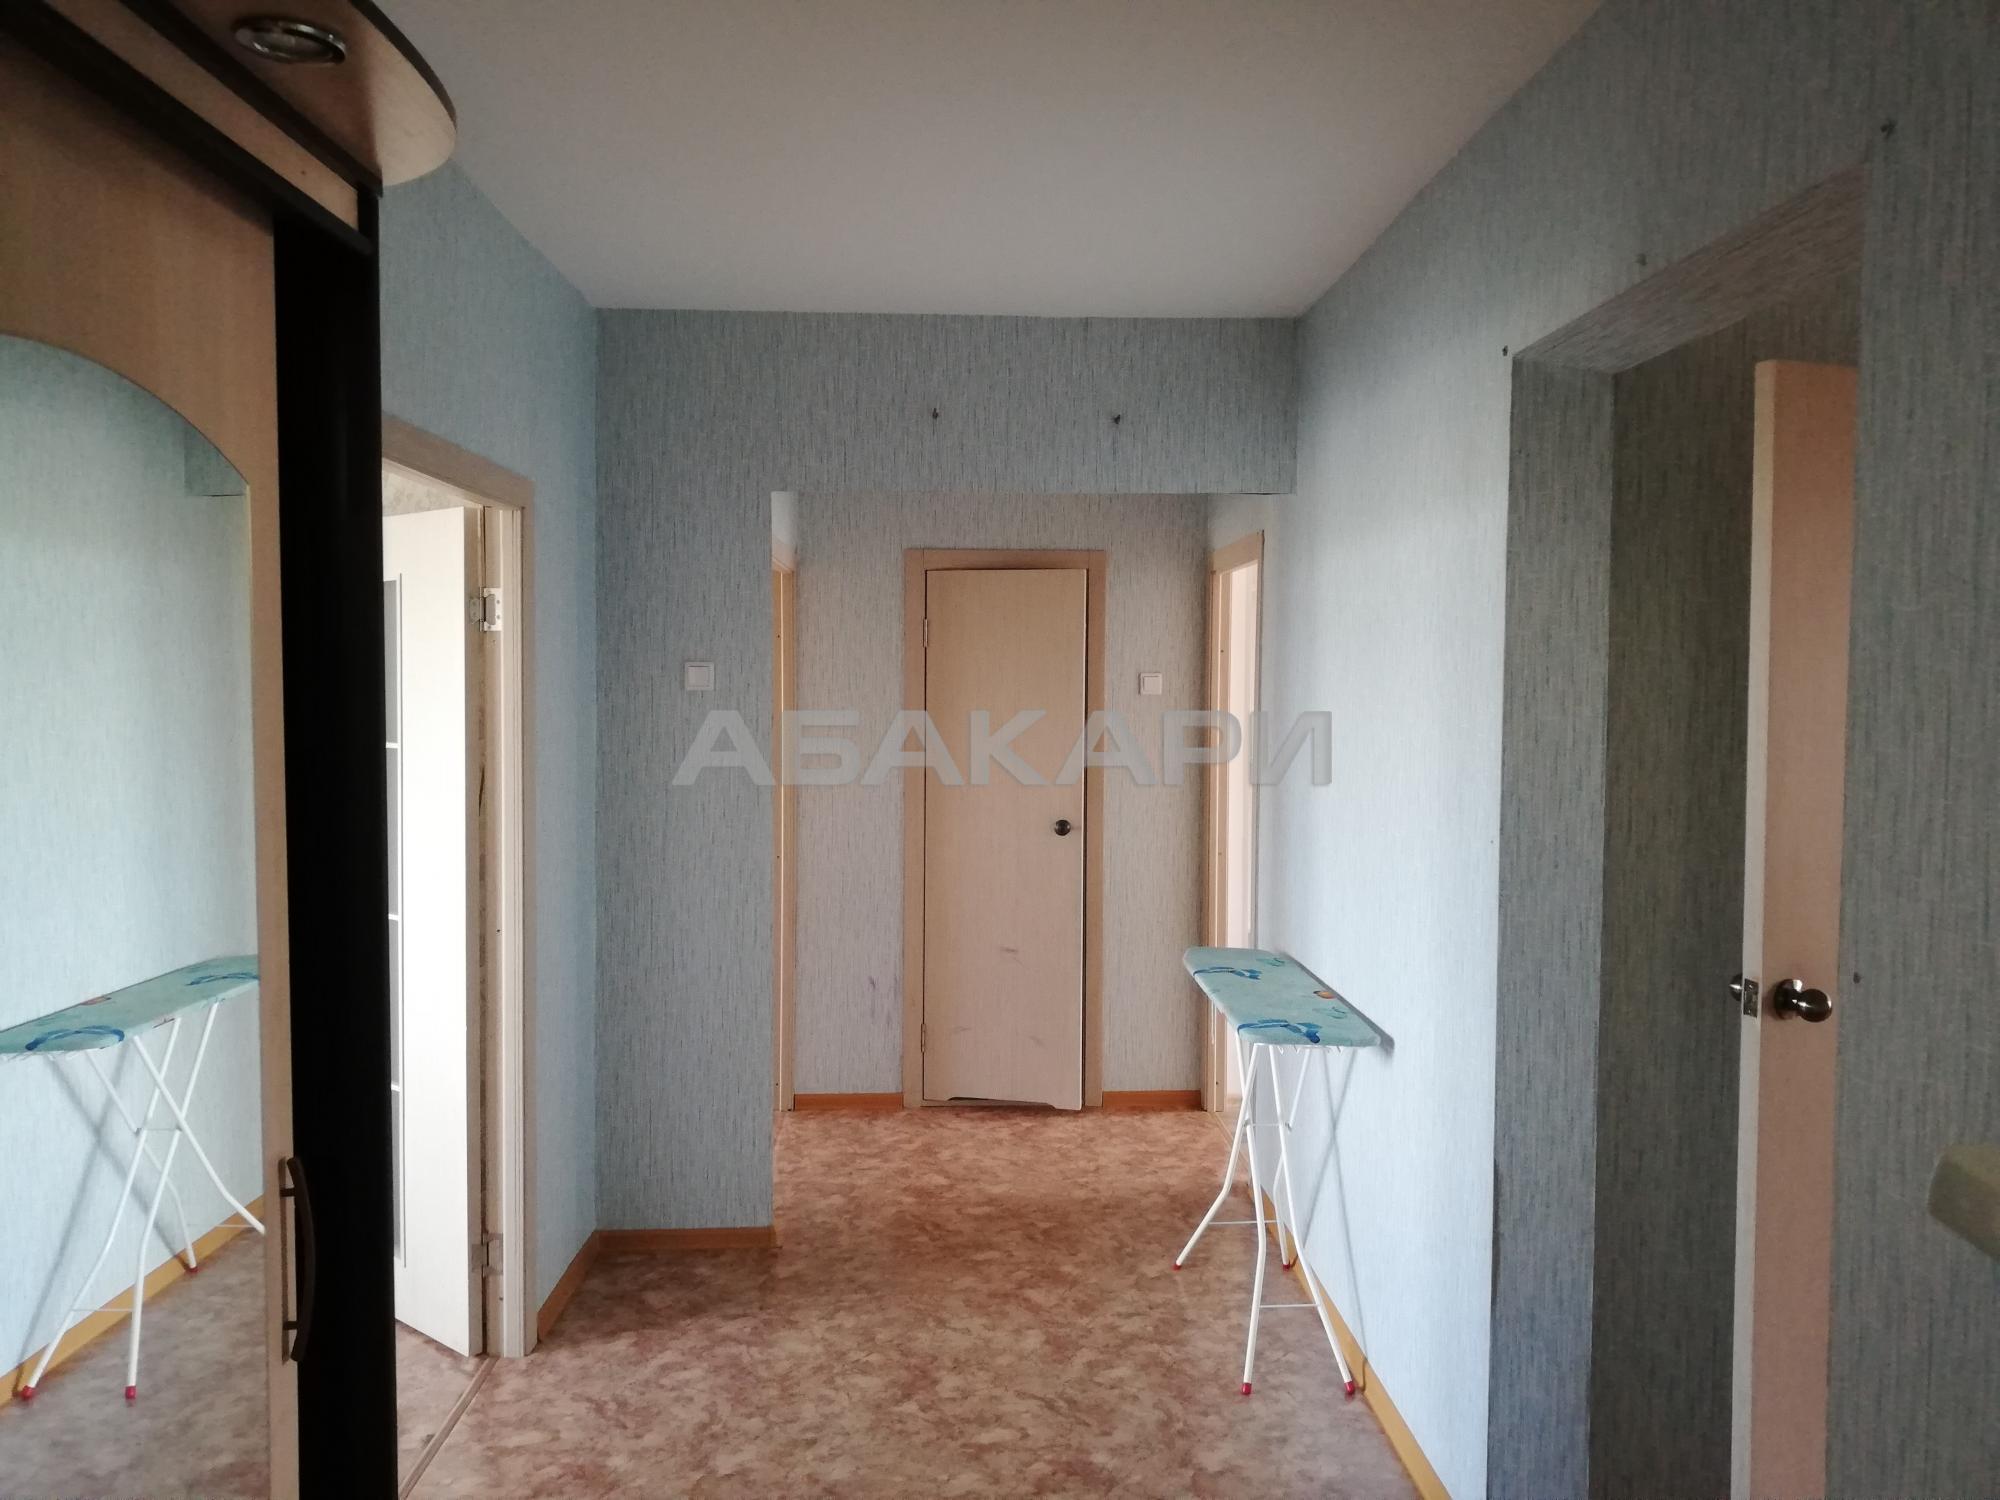 4к квартира Караульная улица, 46 | 25000 | аренда в Красноярске фото 10